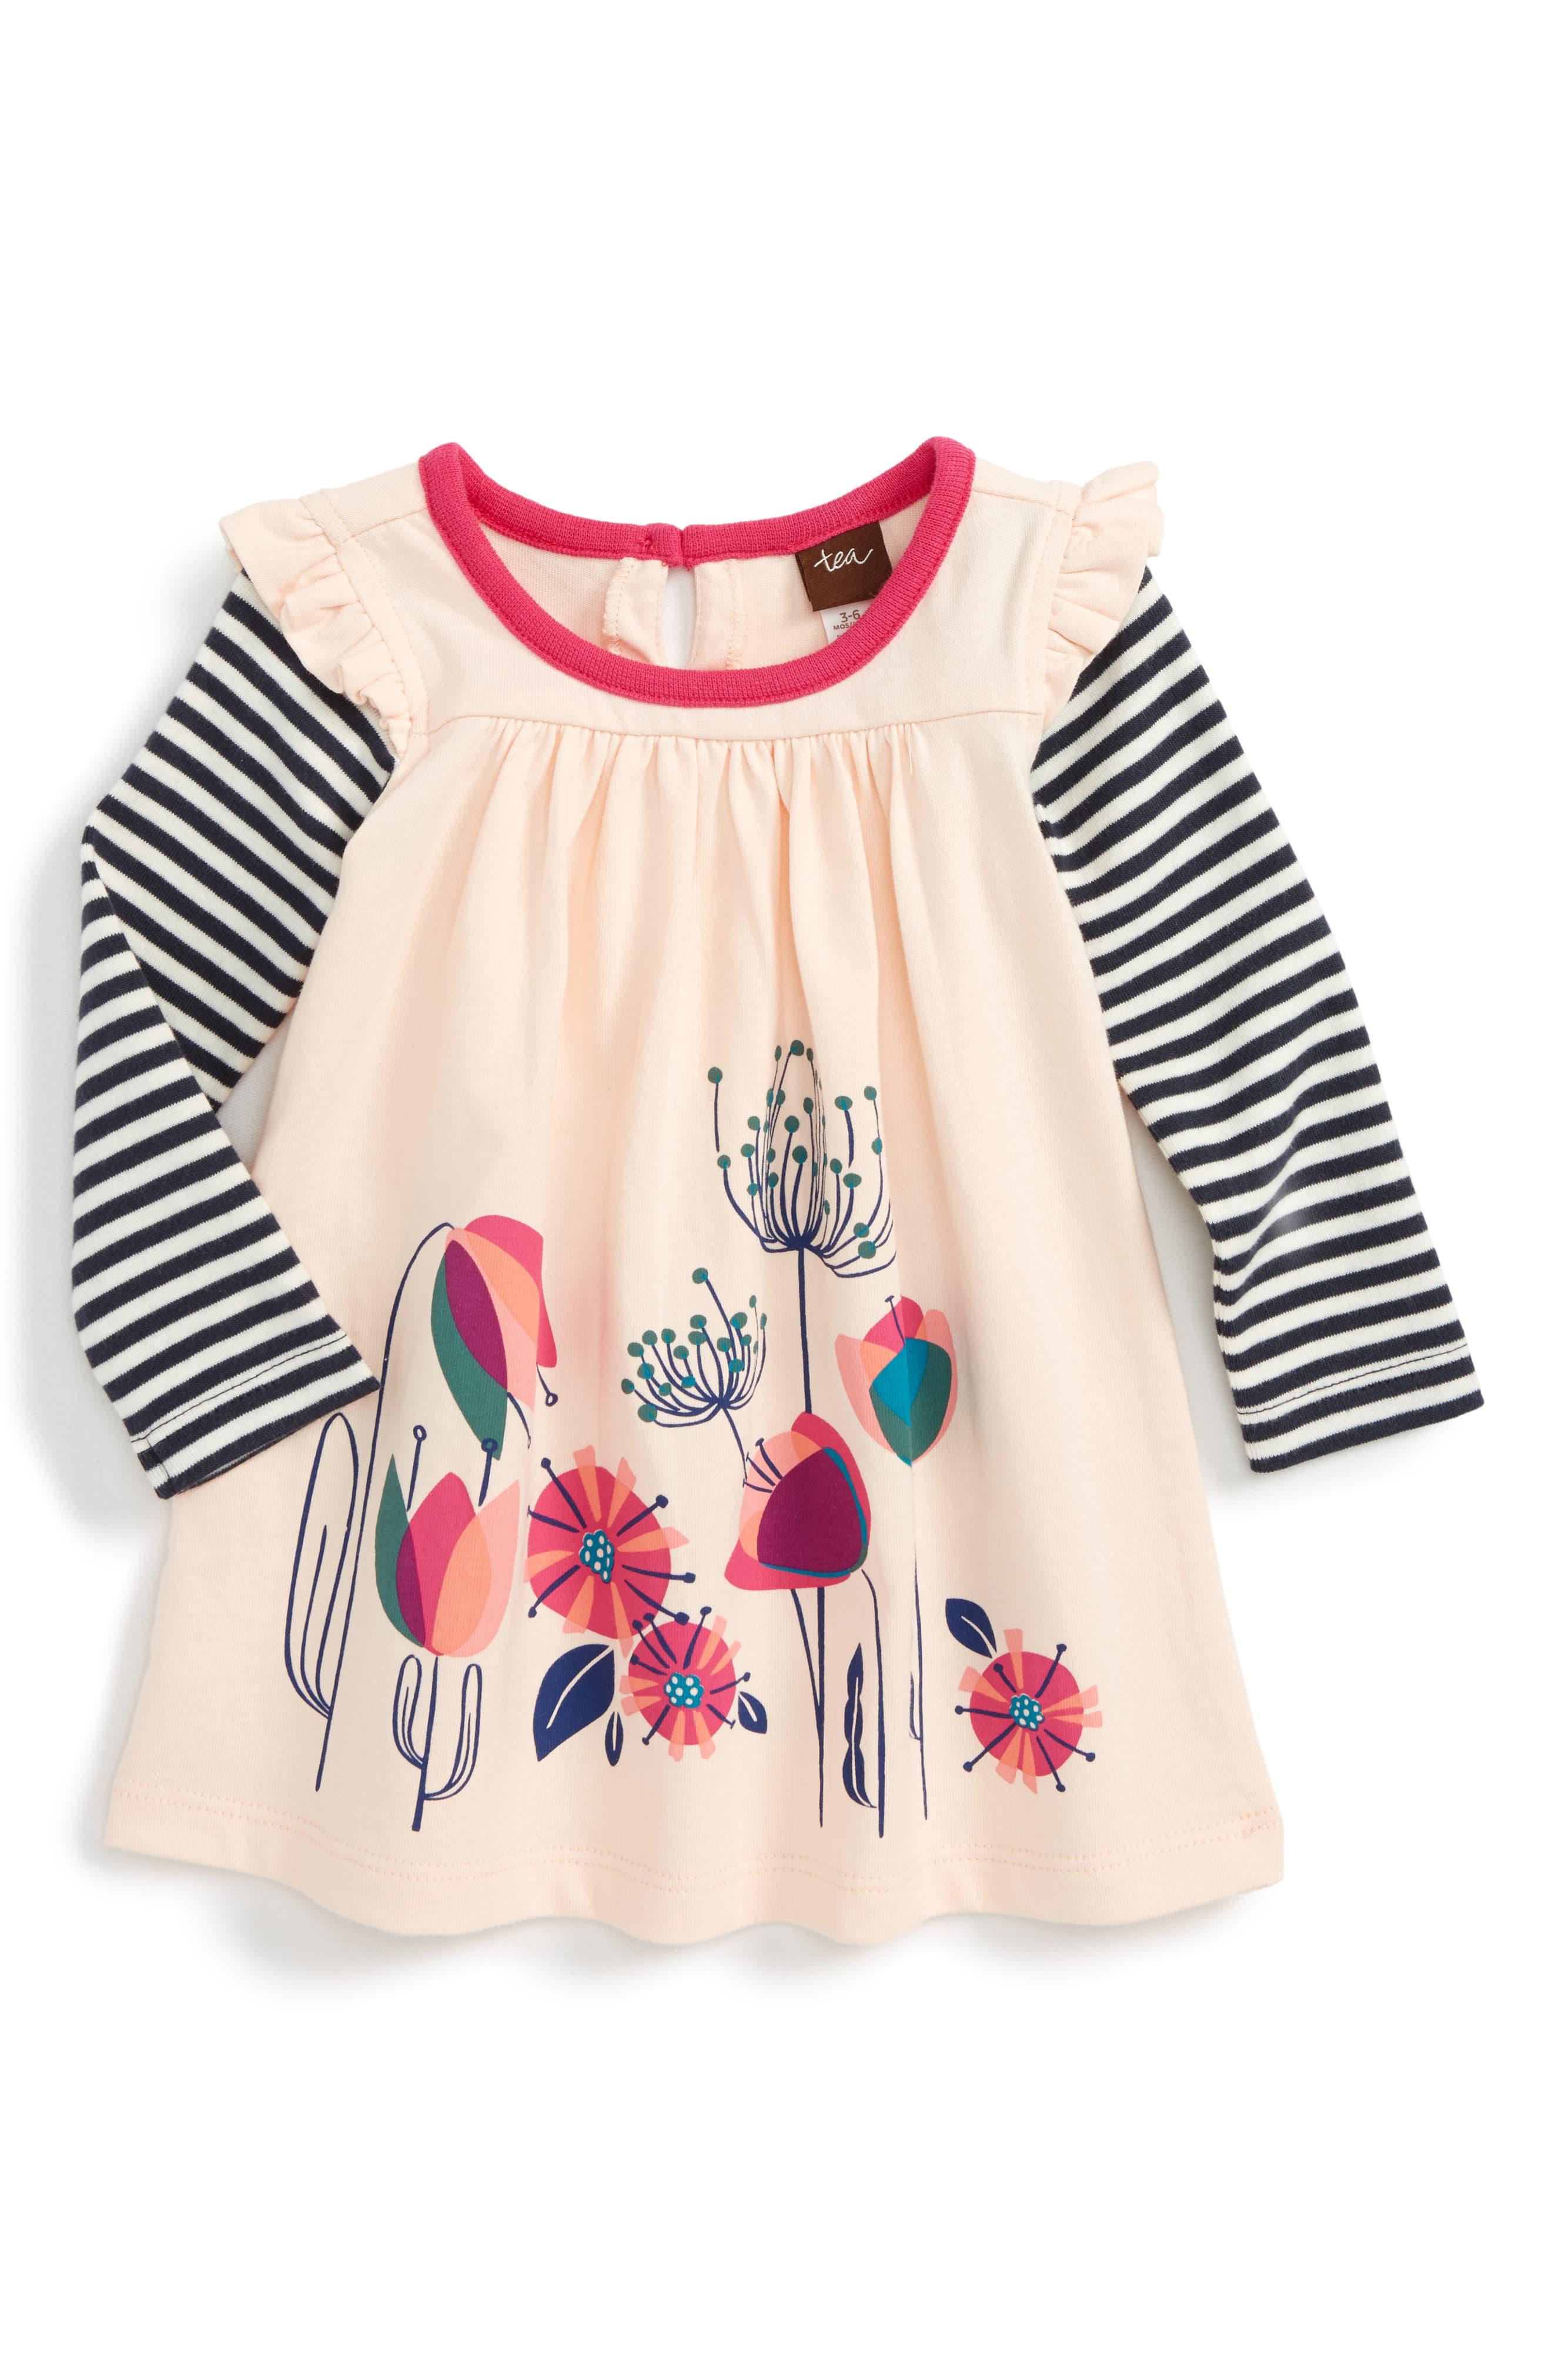 TEA COLLECTION Glasgow Gardens Mighty Mini Double Decker Dress